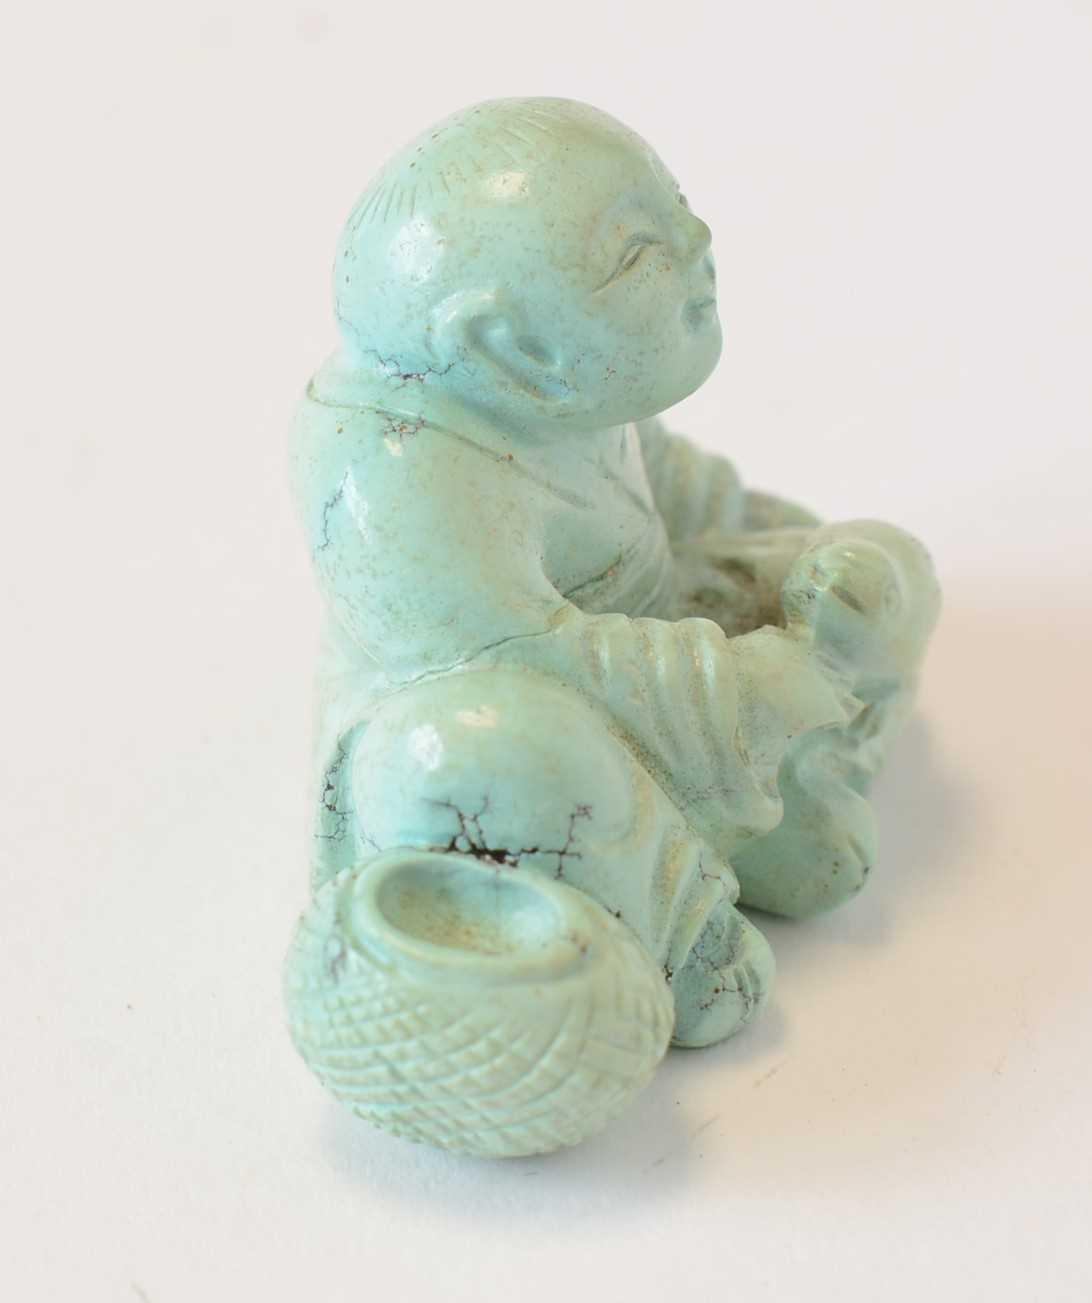 Chinese turquoise figure; jadeite pendant, hardstone cup - Image 13 of 27